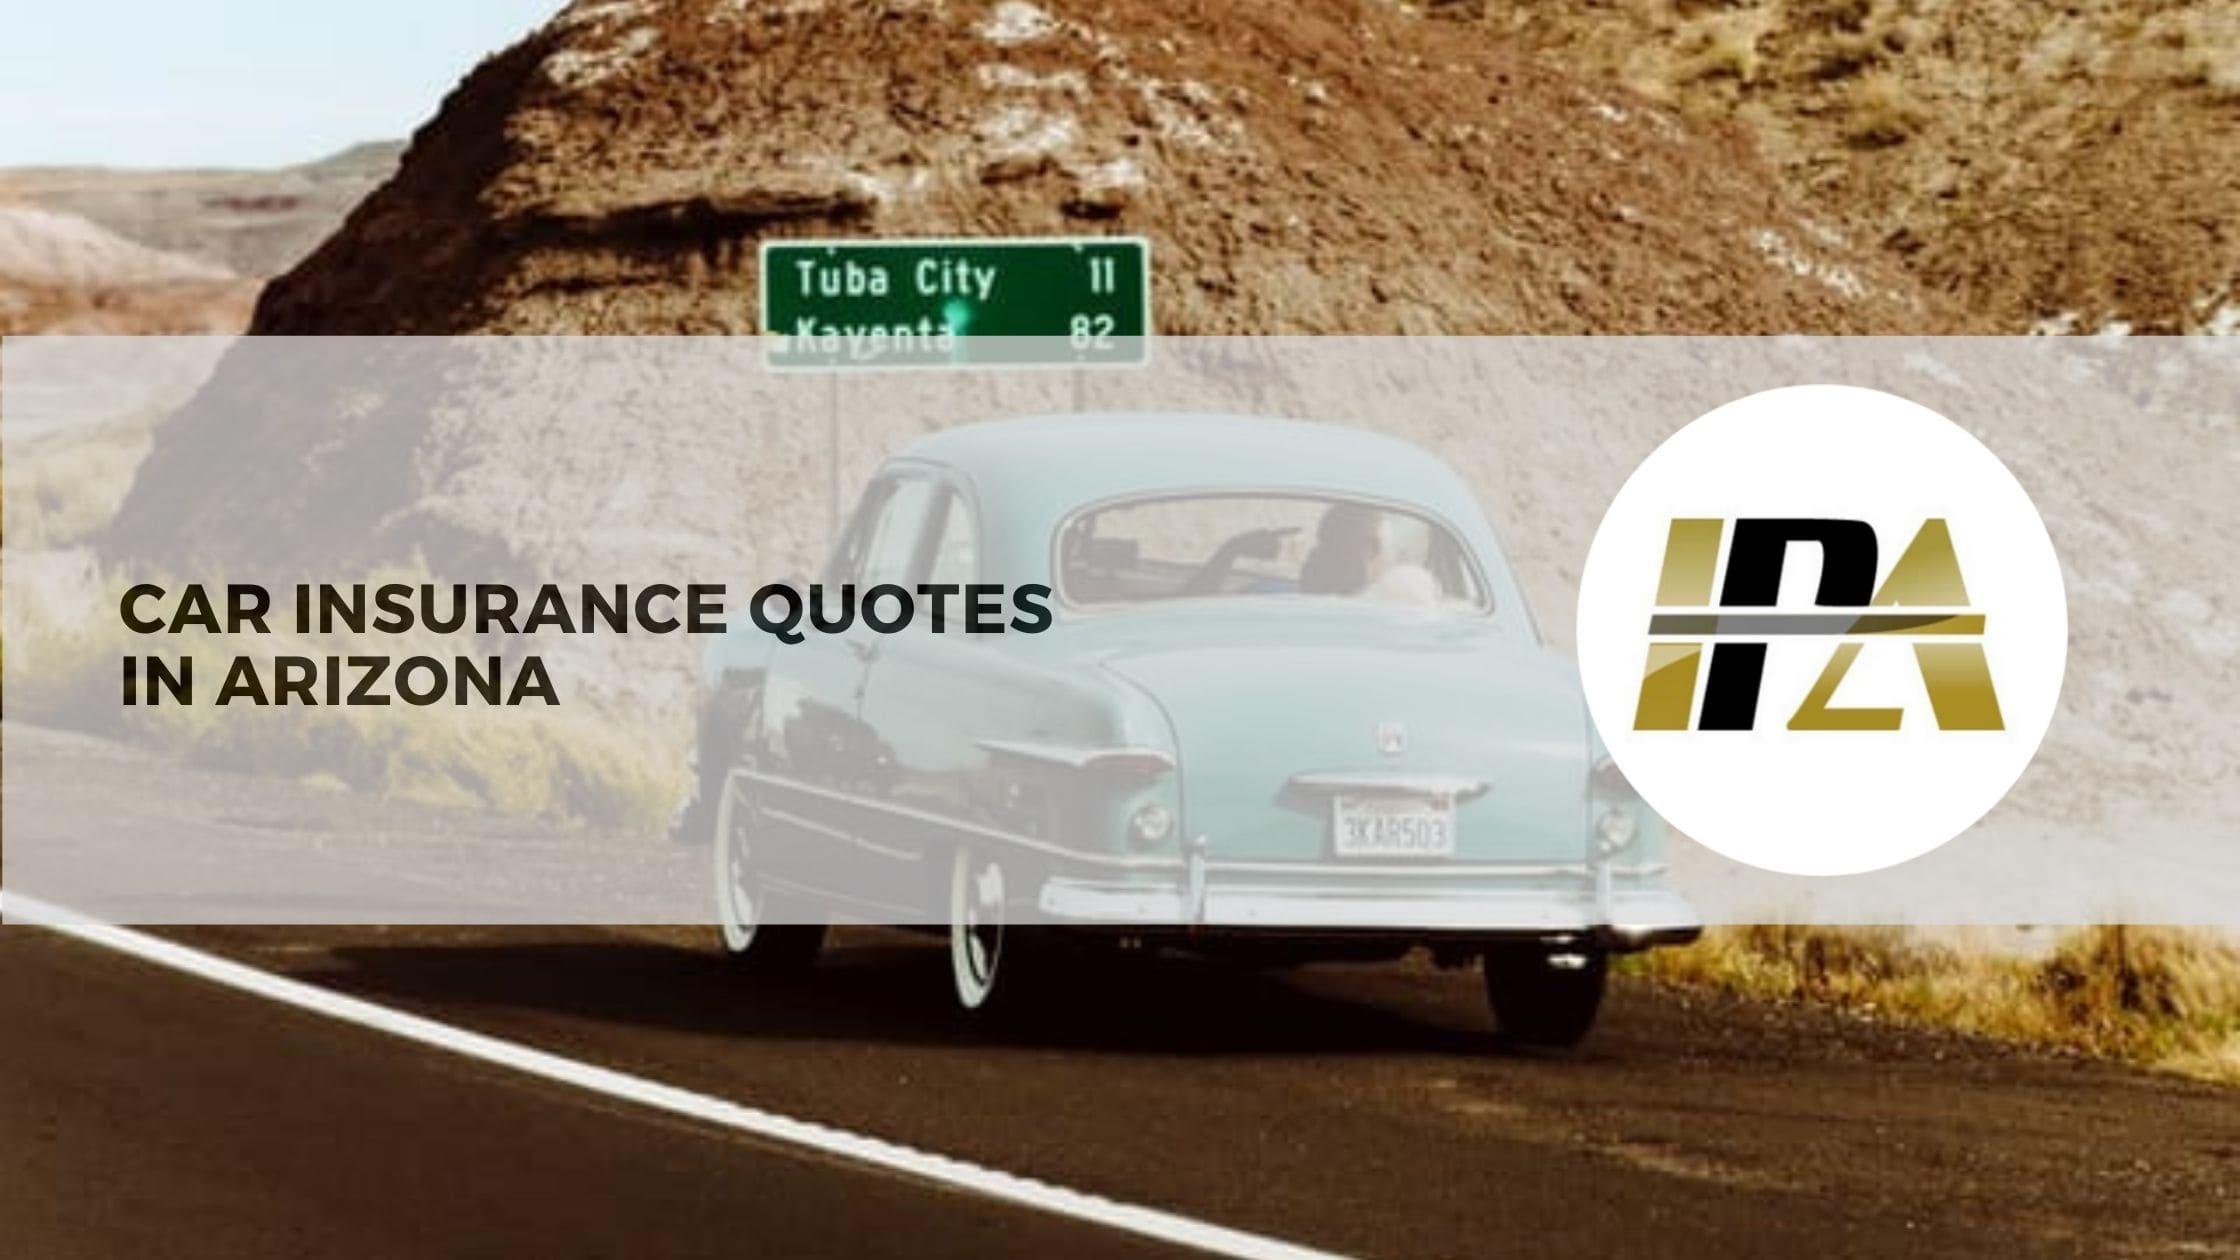 Car insurance quotes in arizona